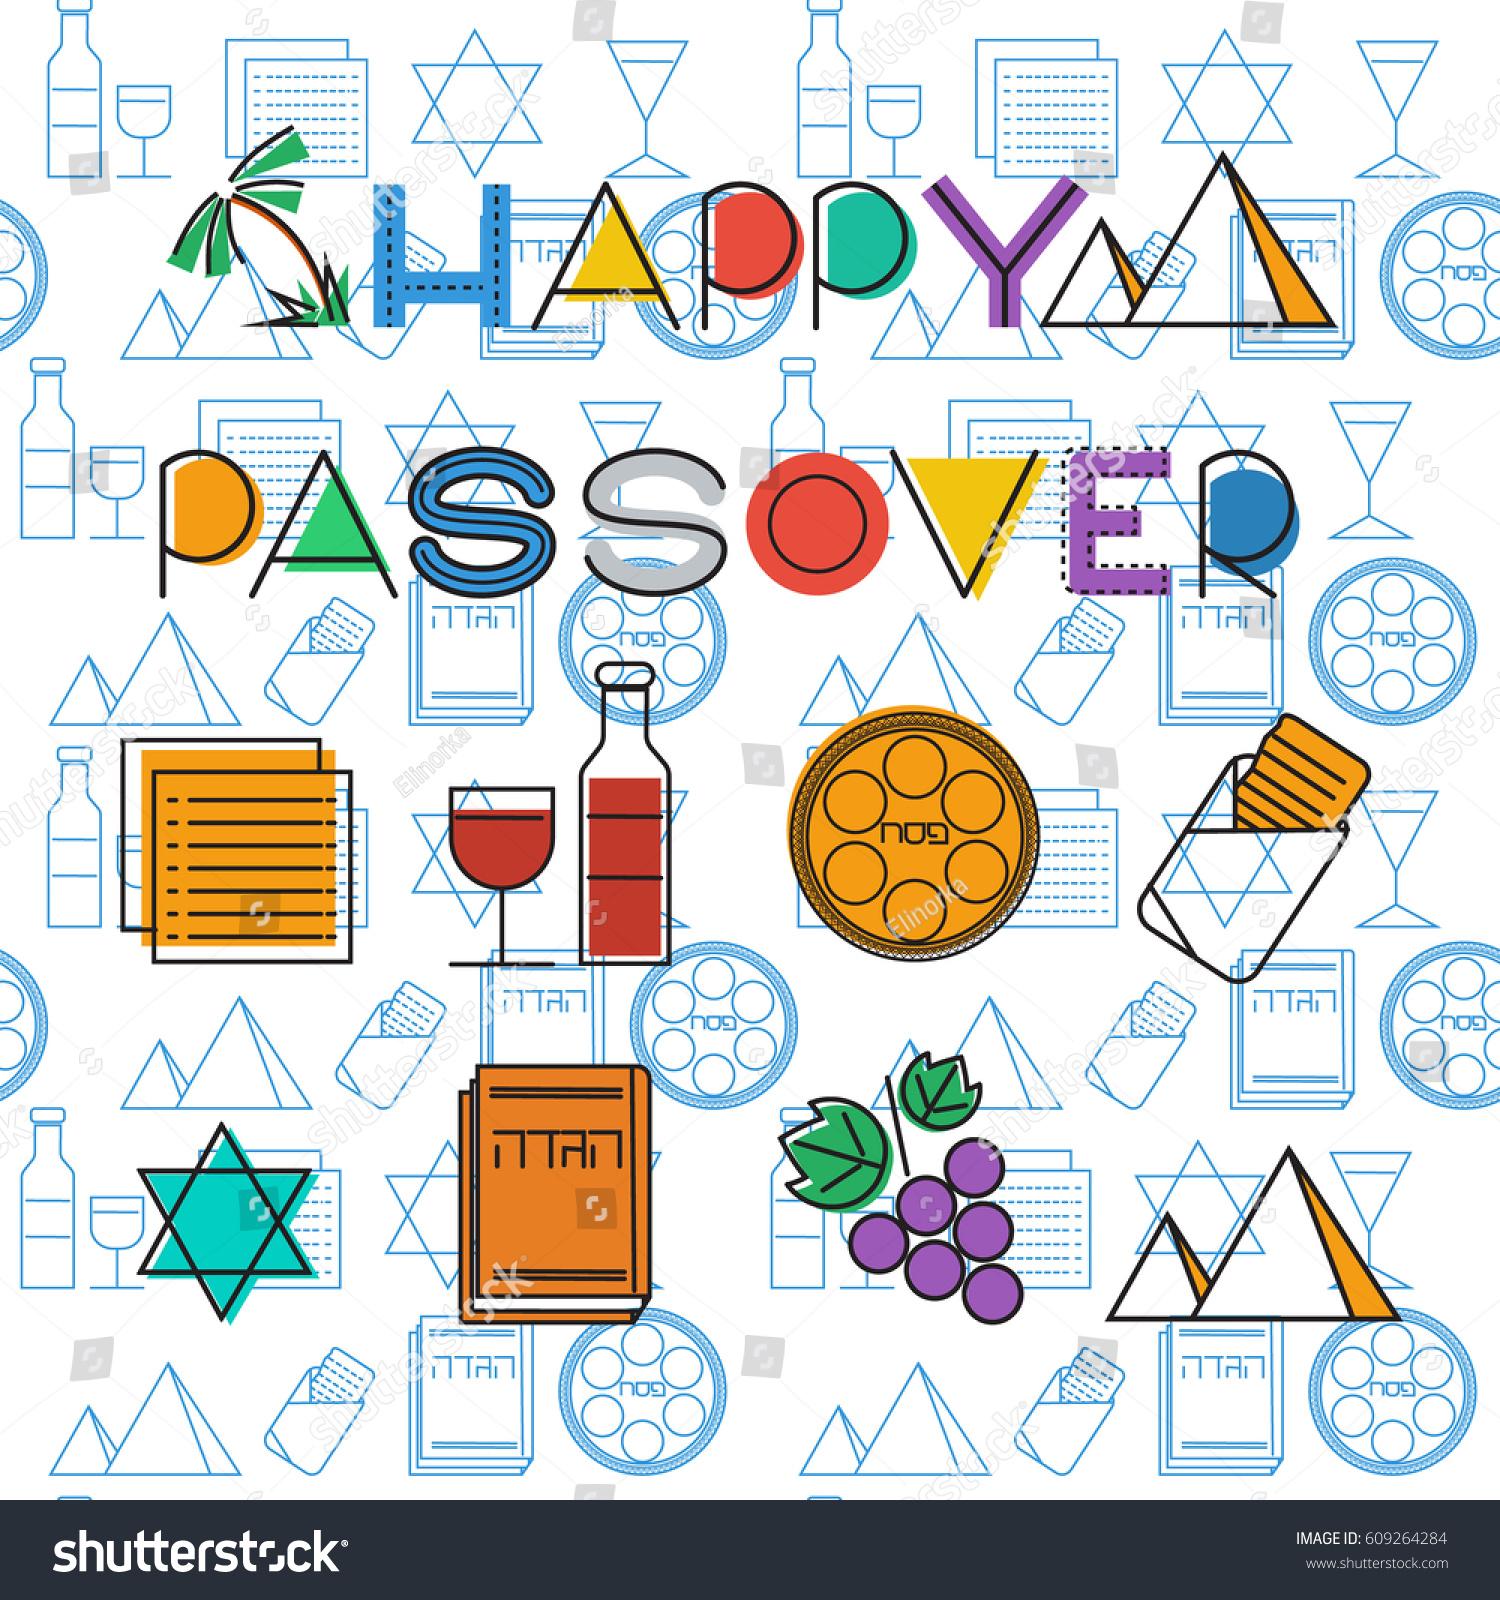 Happy Passover Jewish Holiday Greeting Card Stock Vector Hd Royalty